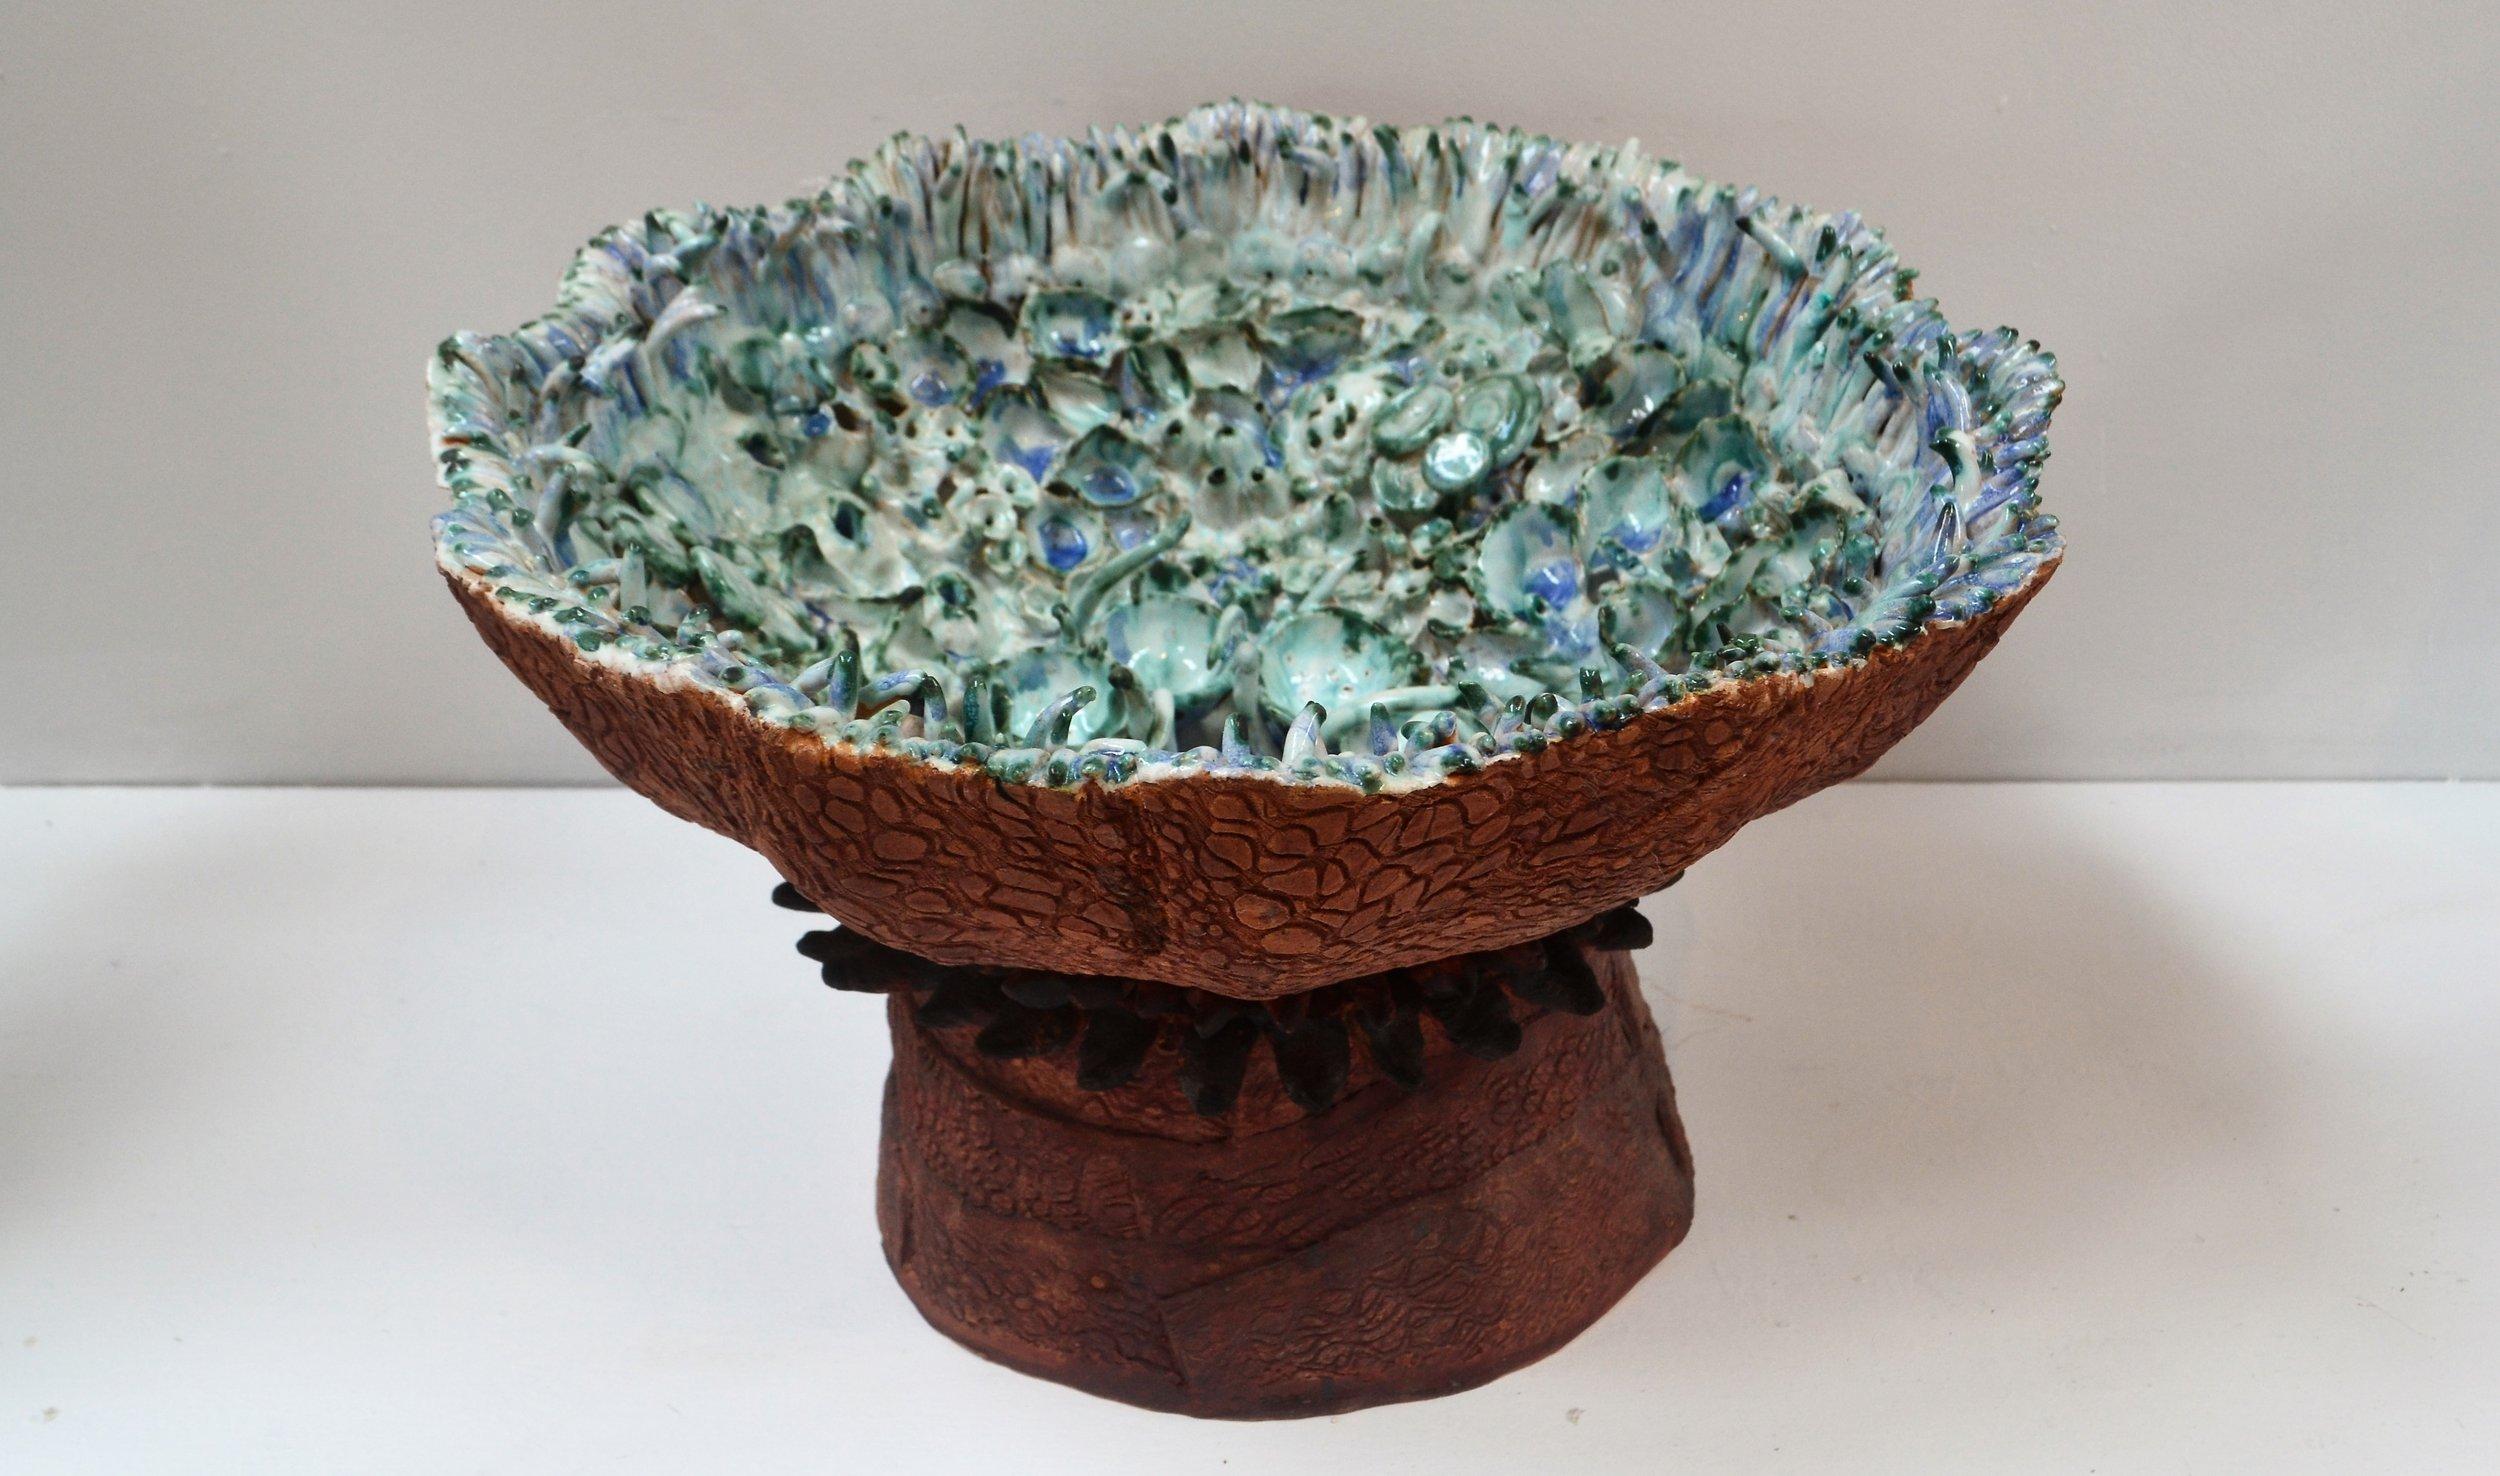 Sea Urchin Bowl  Cherrie James, glazed and fired ceramic  $390.00